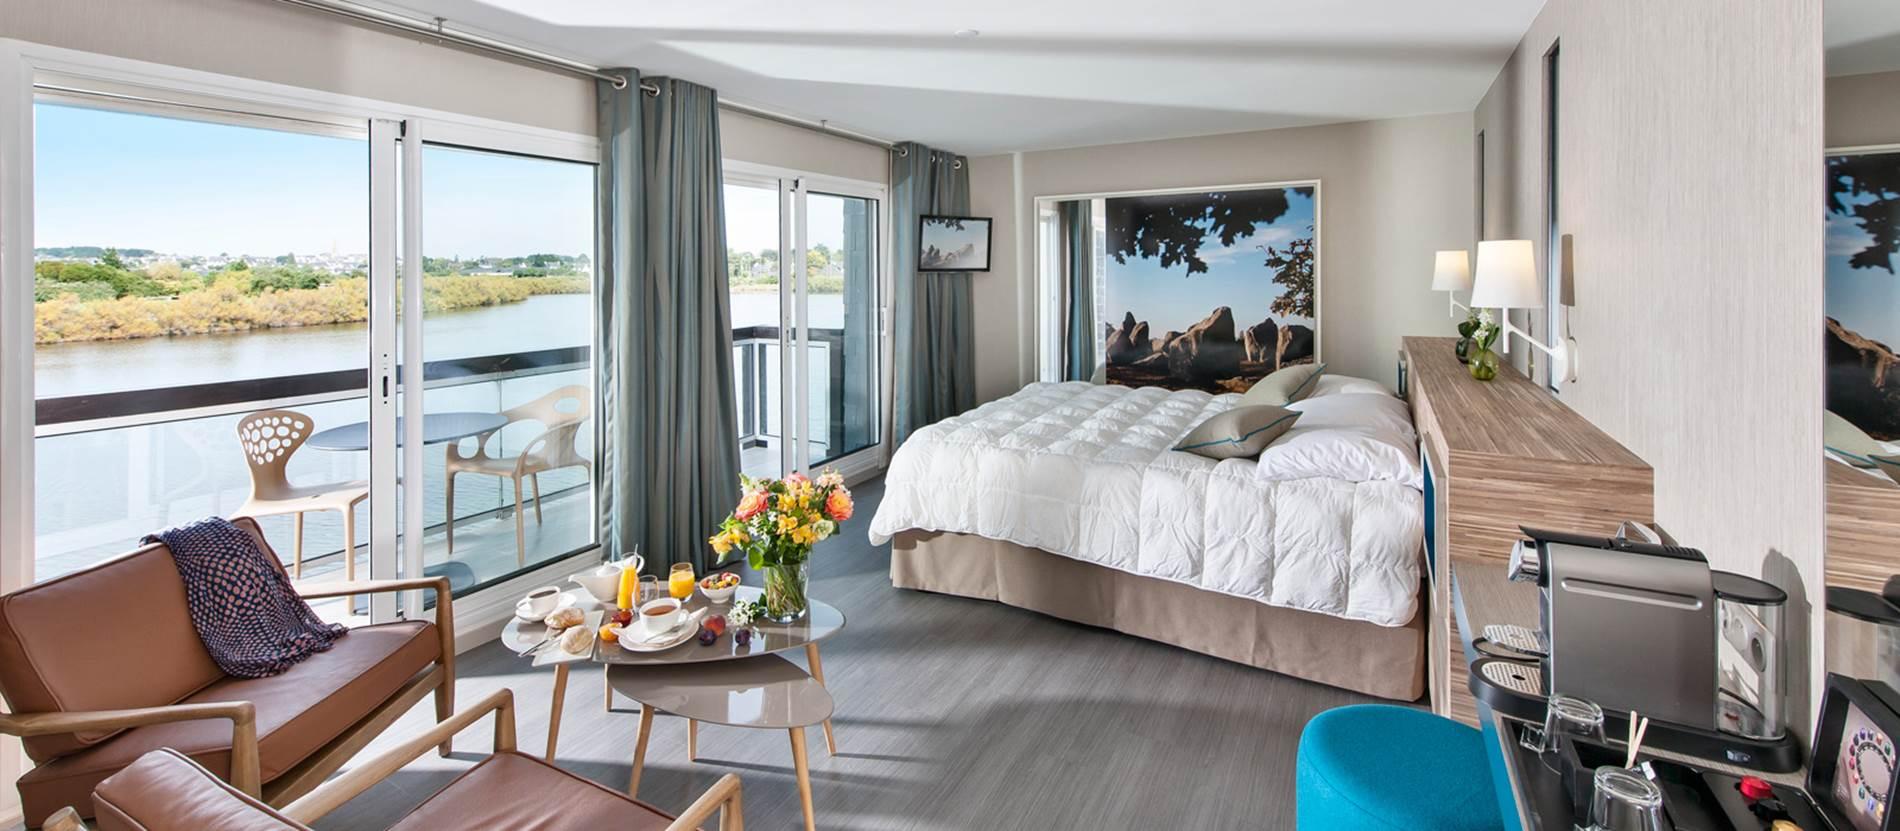 Thalazur-Carnac-Hotel-Les-Salines-Morbihan-Bretagne-Sud © Carnac-Thalasso-Spa-Hotel-Les-Salines-Carnac